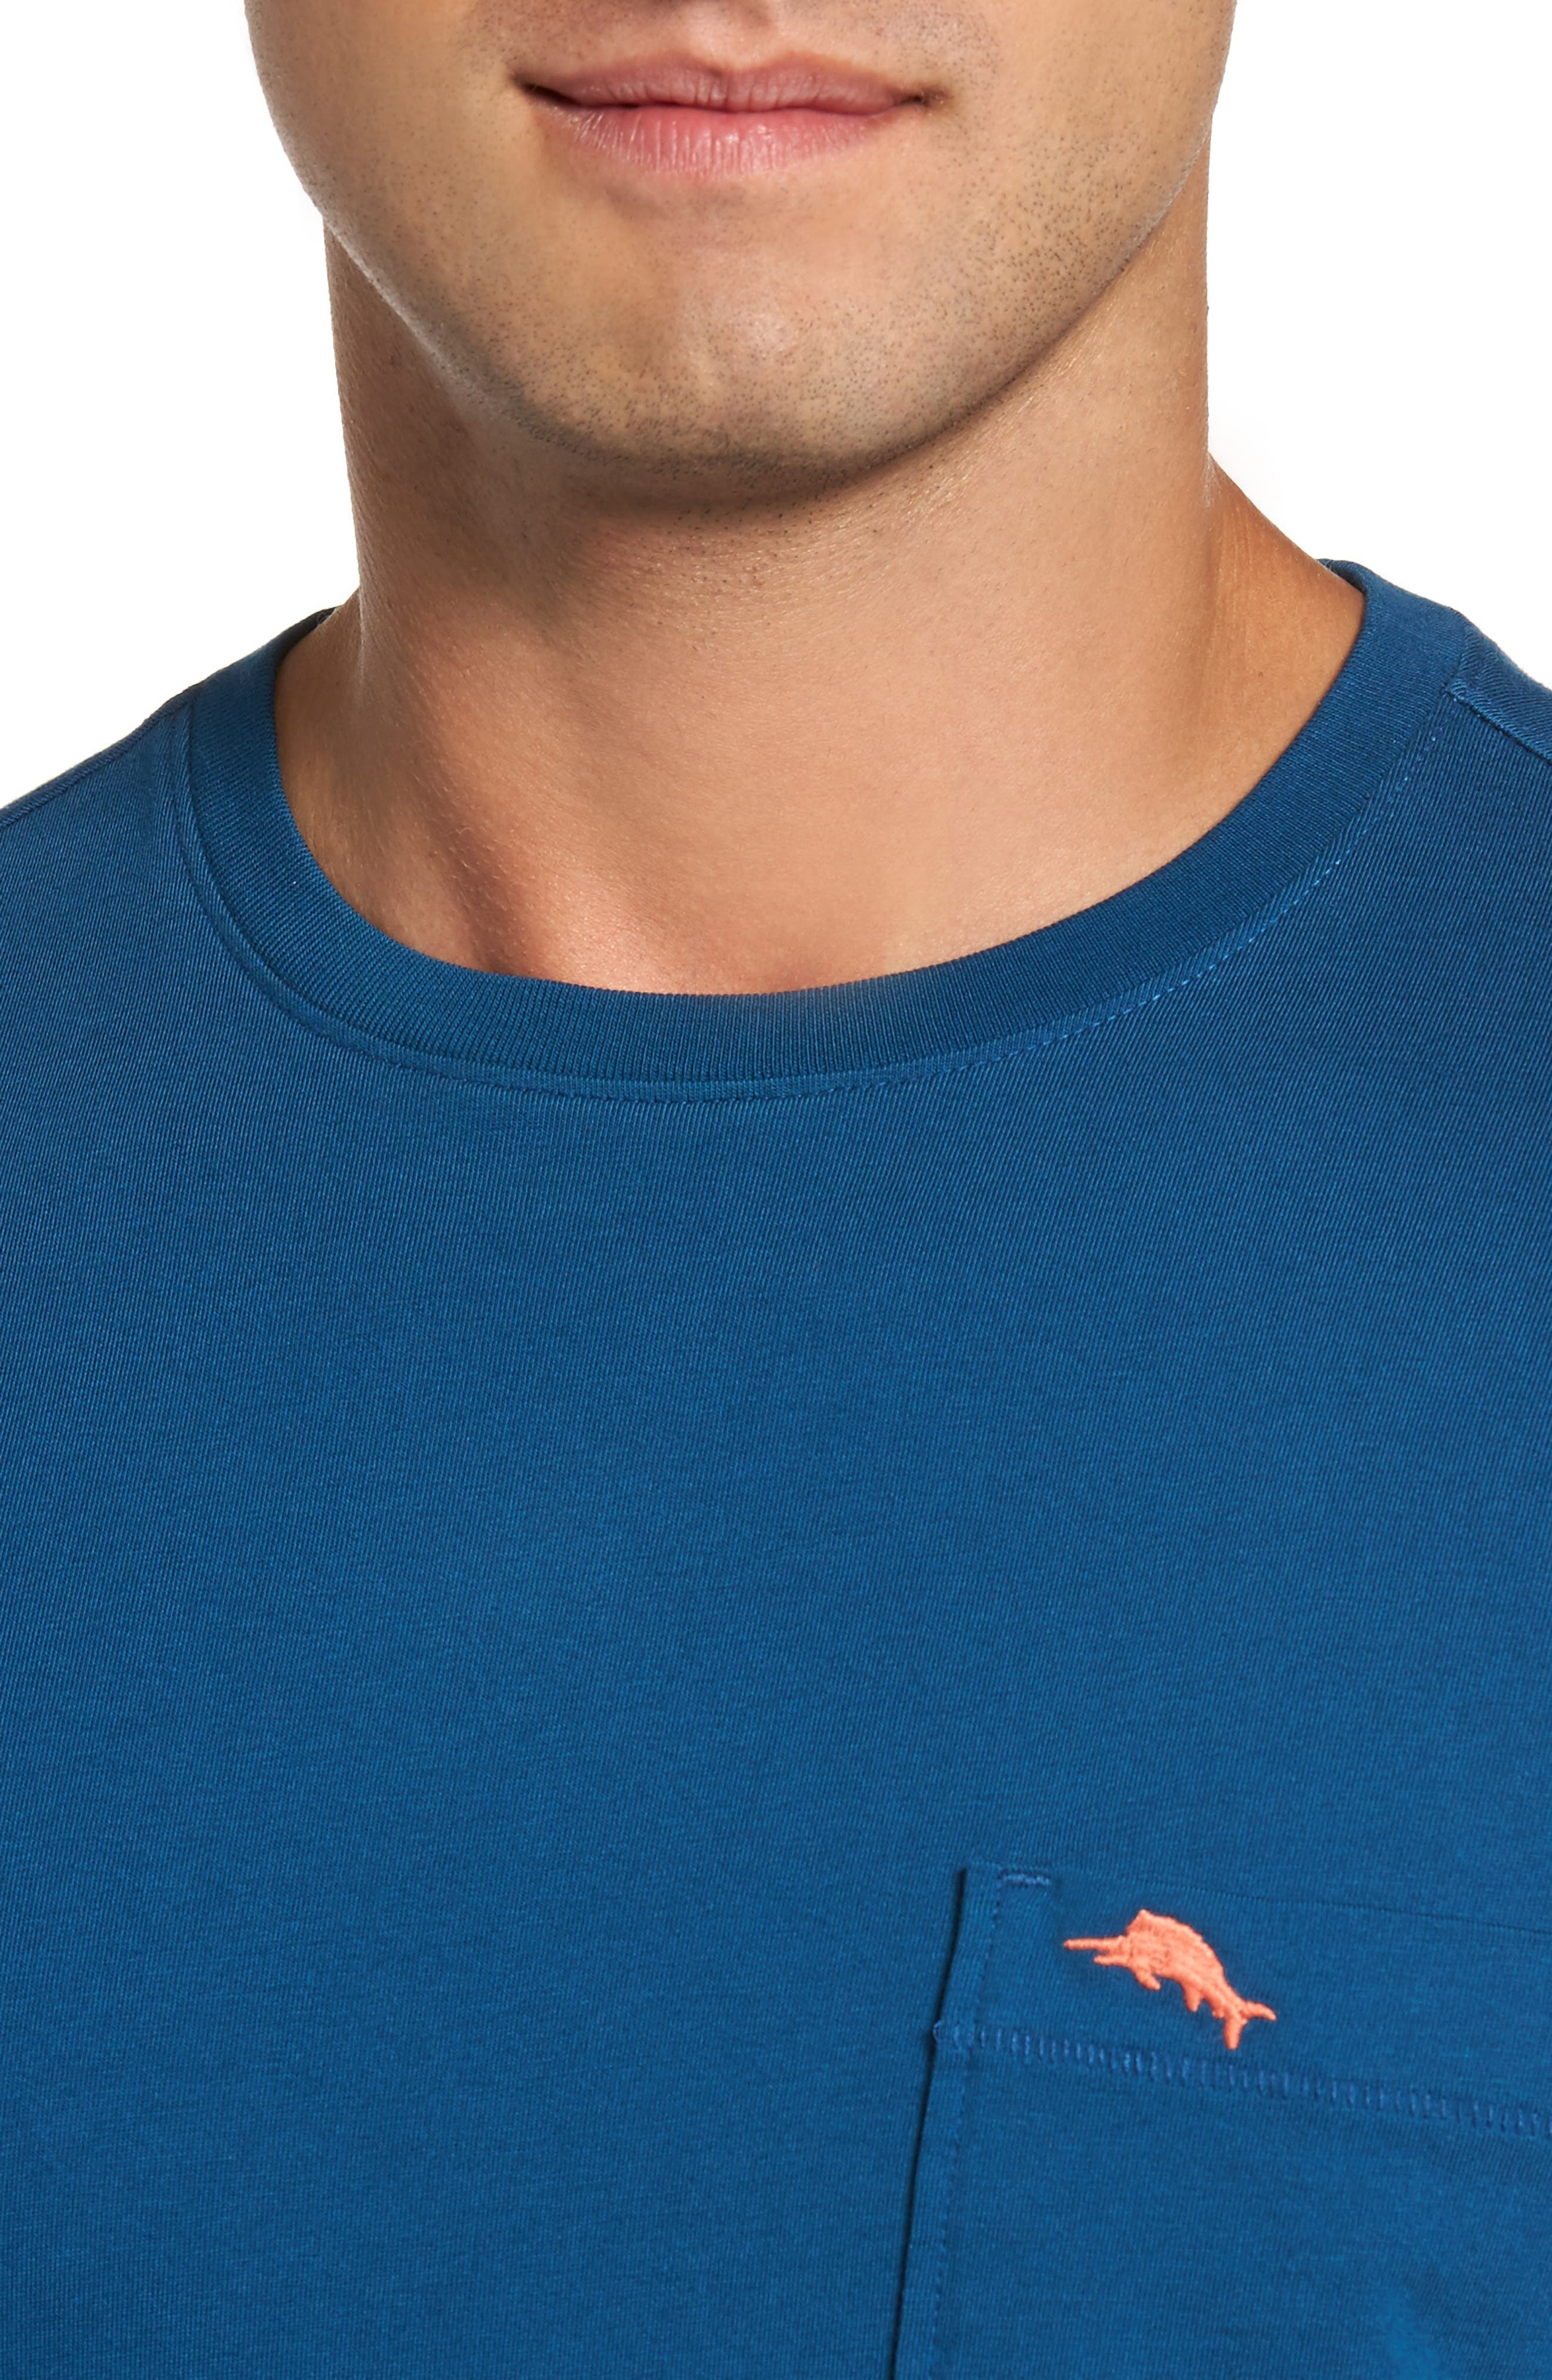 Alternate Image 4  - Tommy Bahama 'Bali Skyline' Long Sleeve Pima Cotton T-Shirt (Big & Tall)